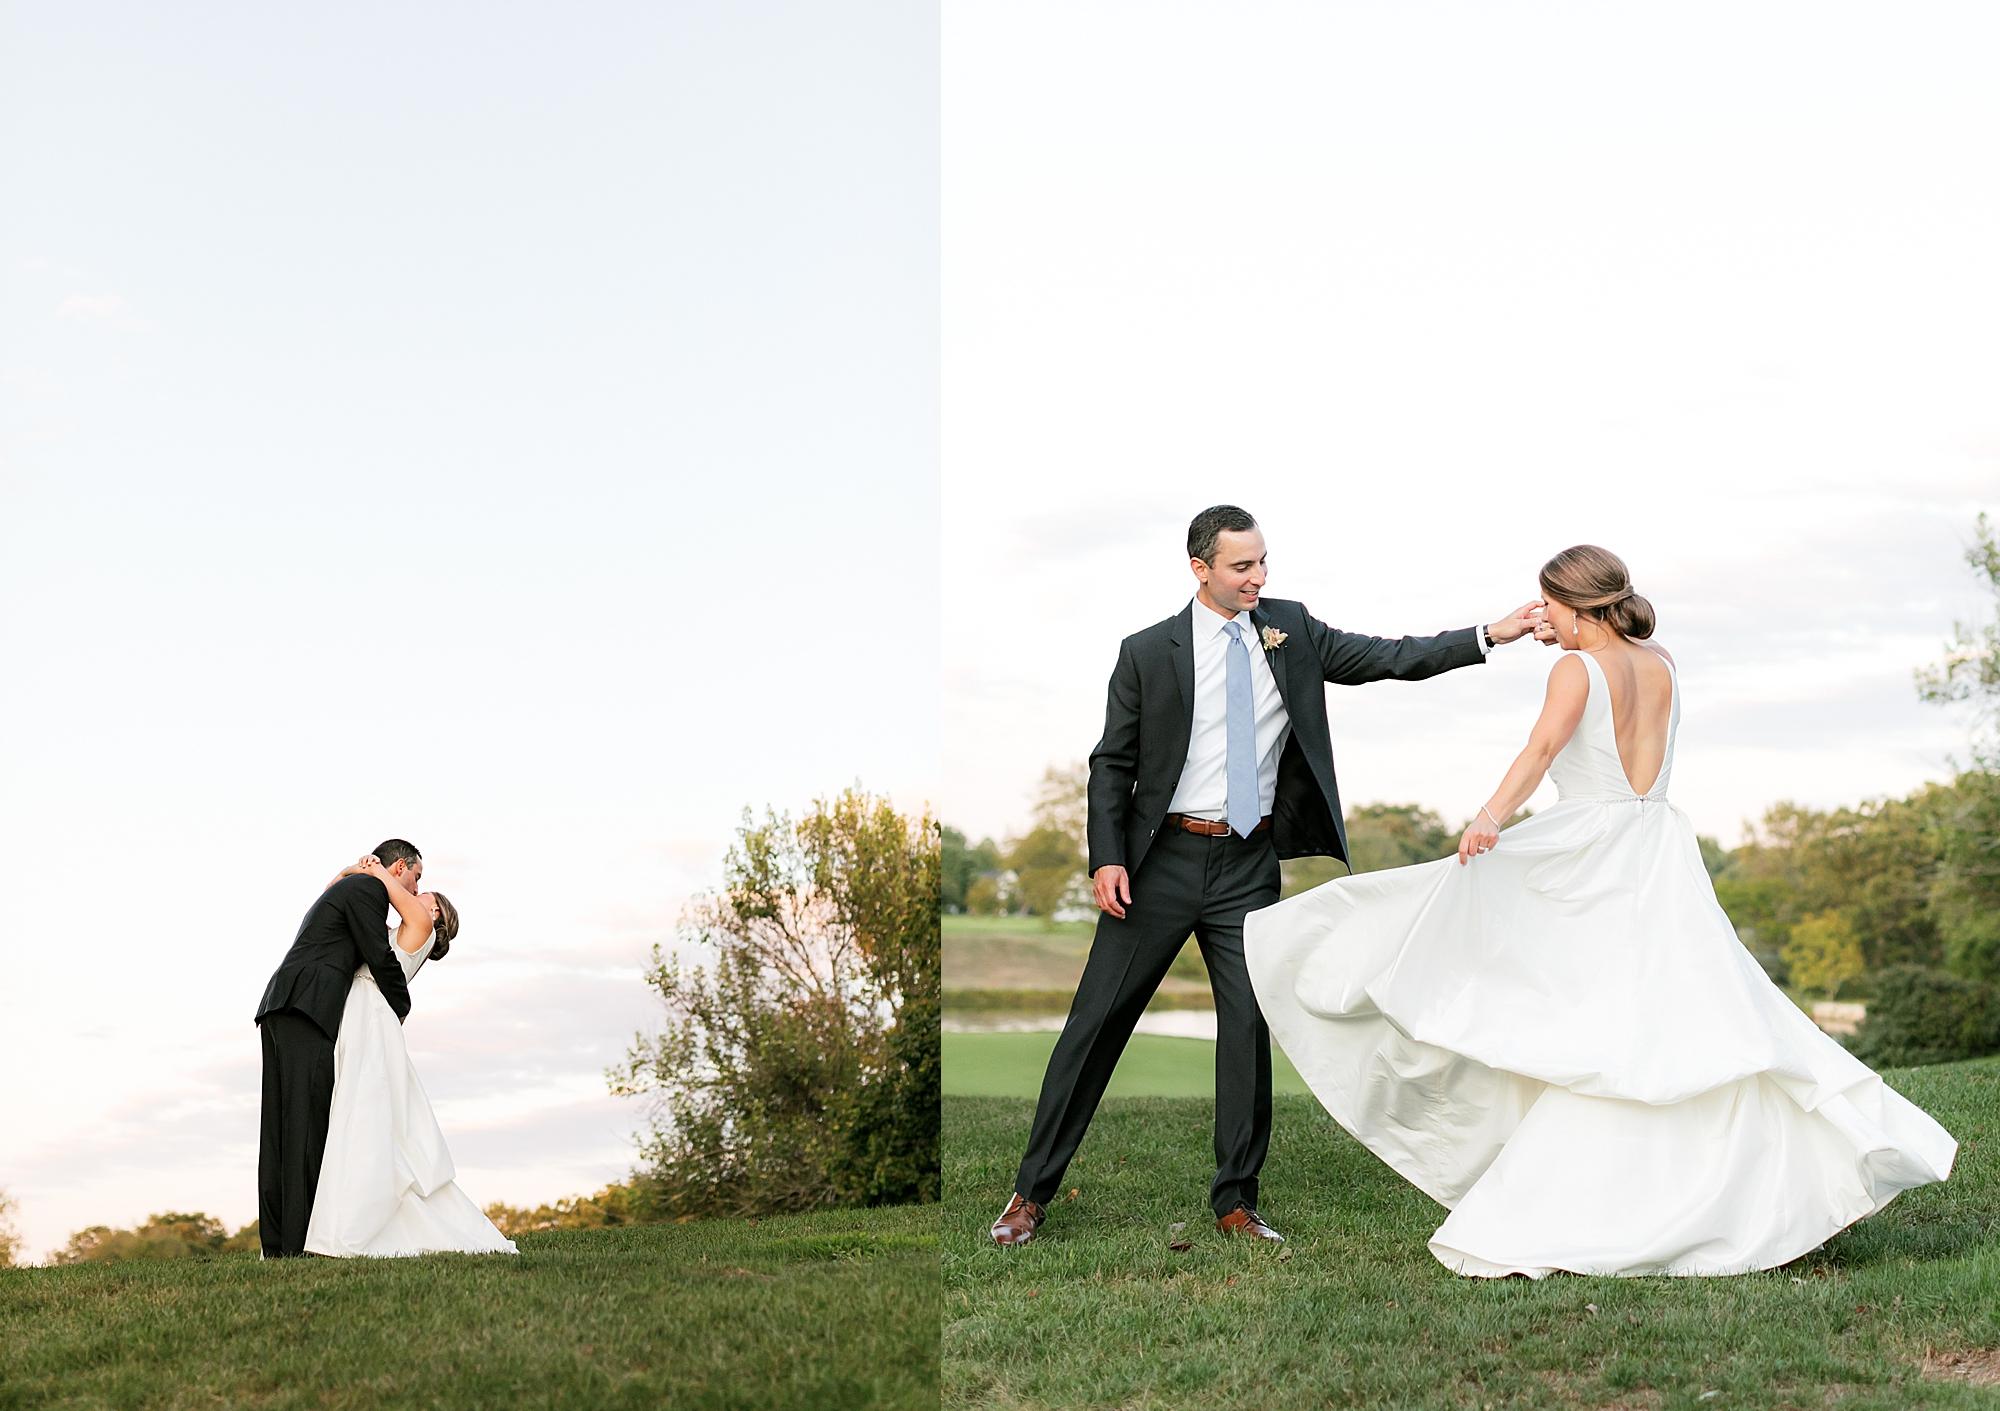 Princeton New Jersey Film Wedding Photographer Princeton University Wedding Photography by Magdalena Studios NJ Wedding Photographer63